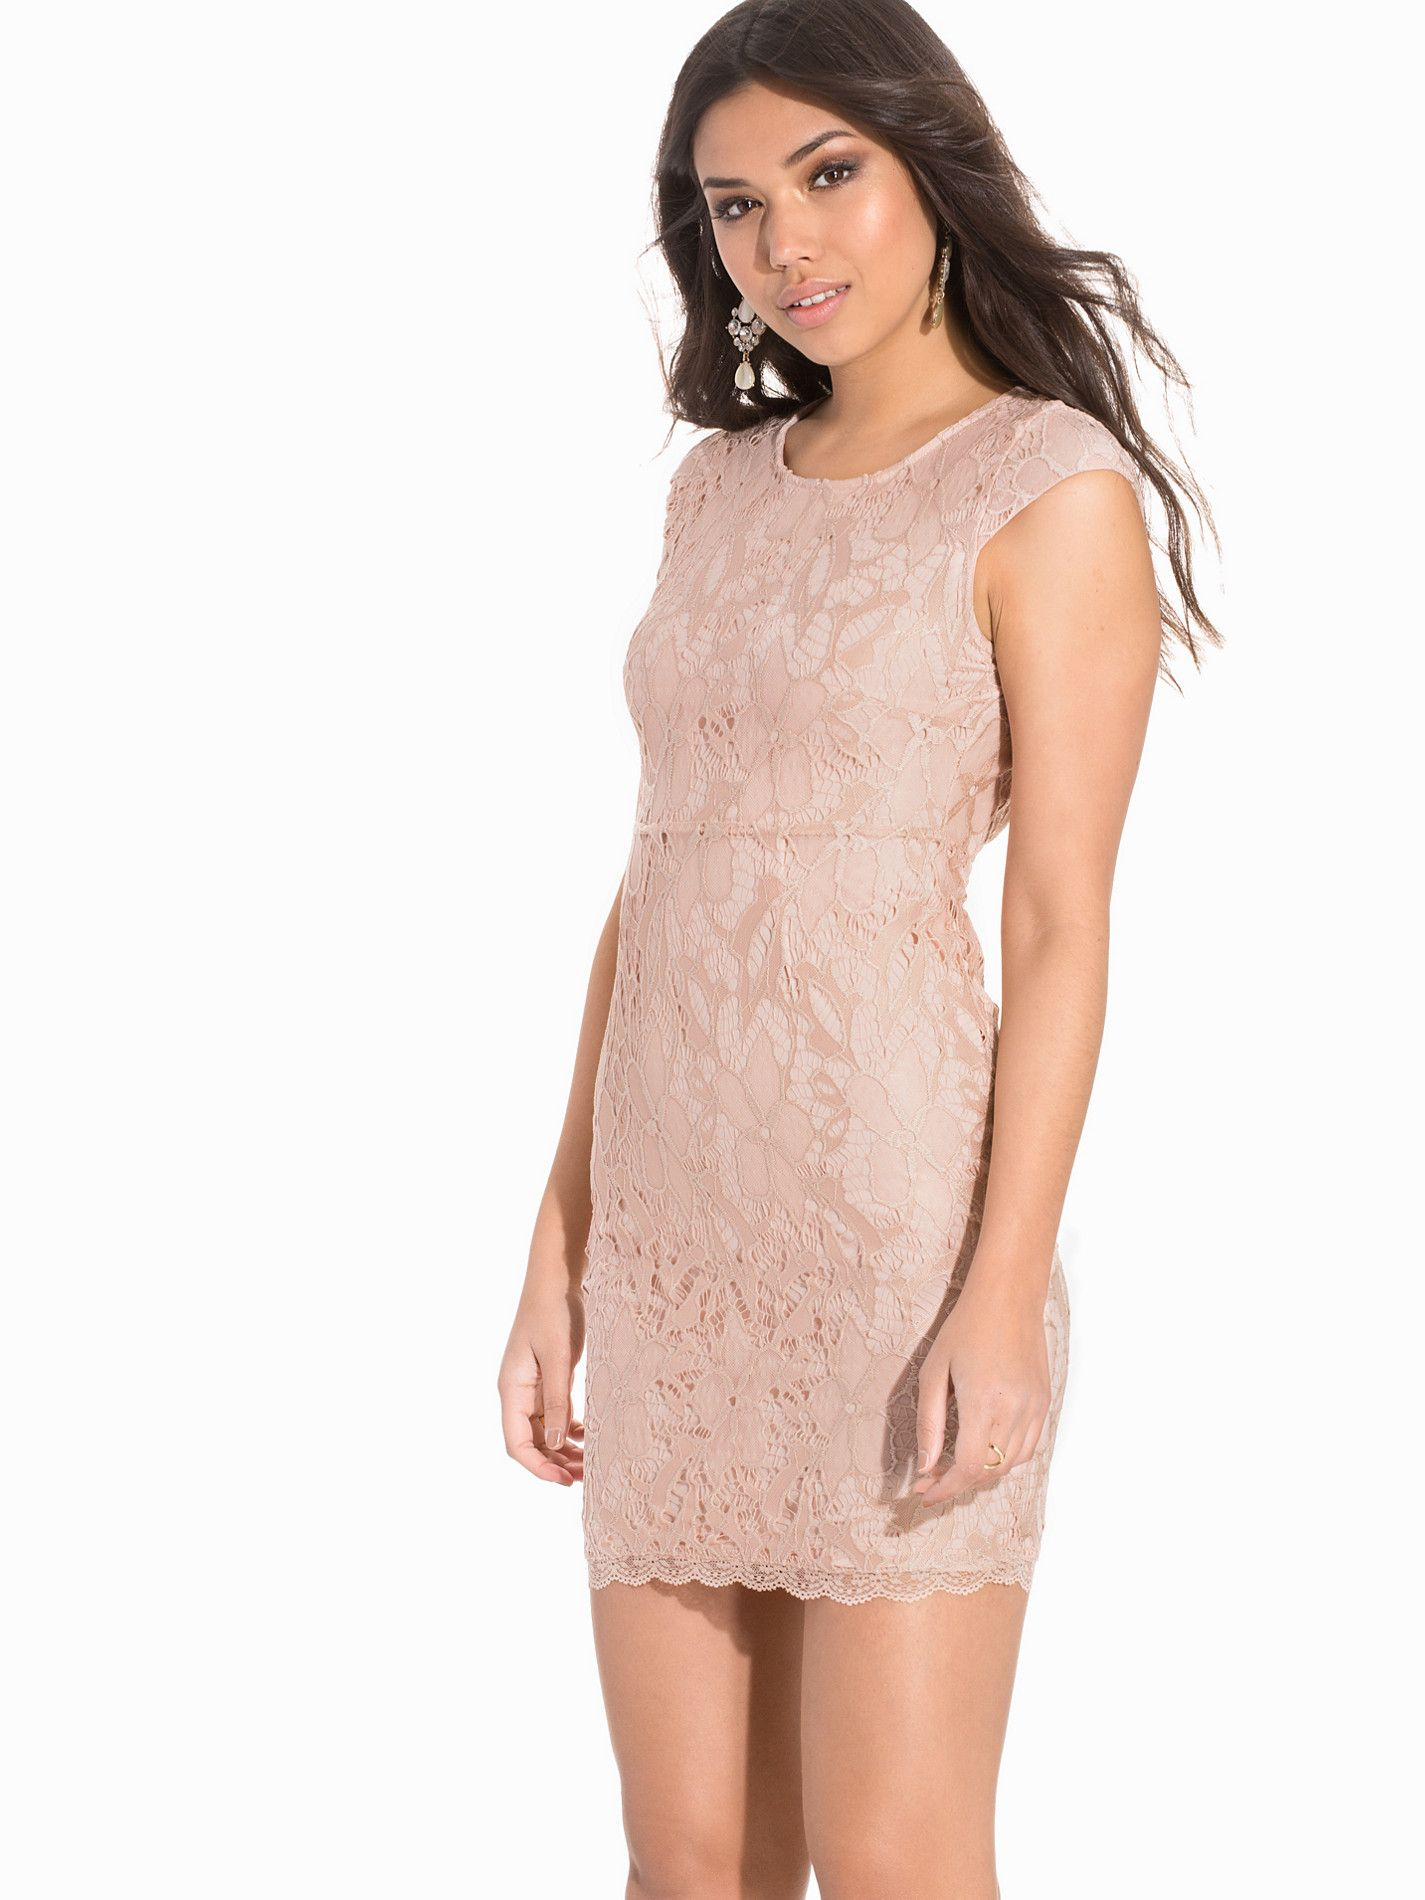 Vmlale S/S Lace Short Dress Dr4 - Vero Moda - Vaalea Pinkki - Juhlamekot - Vaatteet - Nainen - Nelly.com